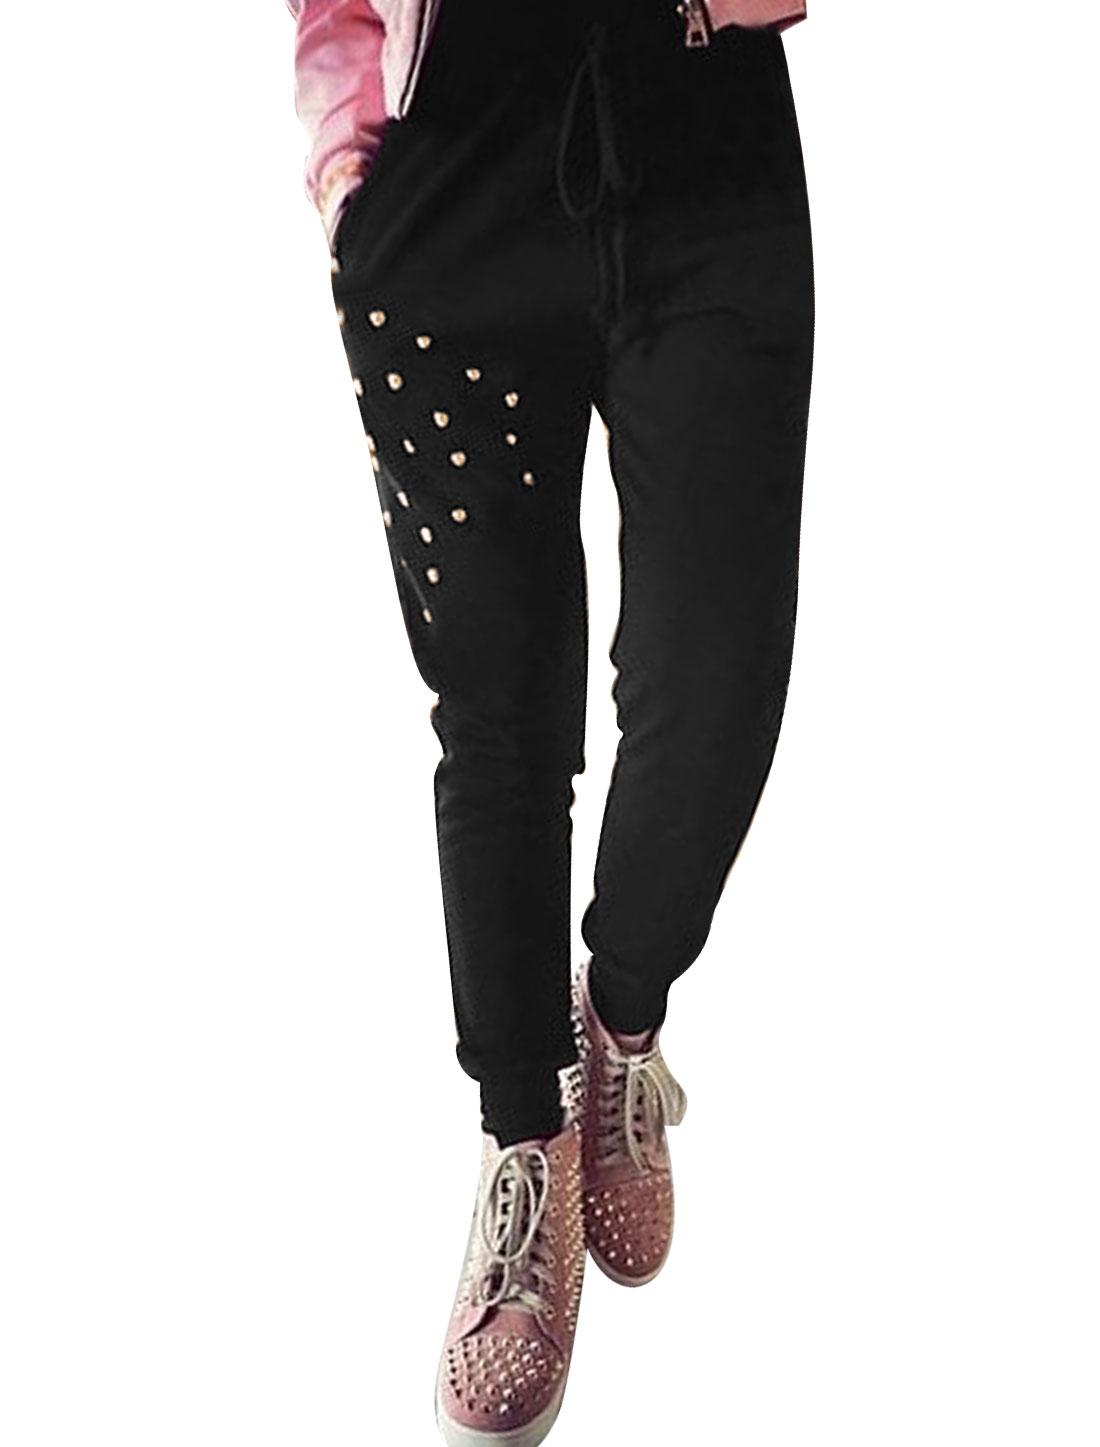 Women Elastic Ribbed Cuffs Metal Rivet Decor Leisure Pants Black XS